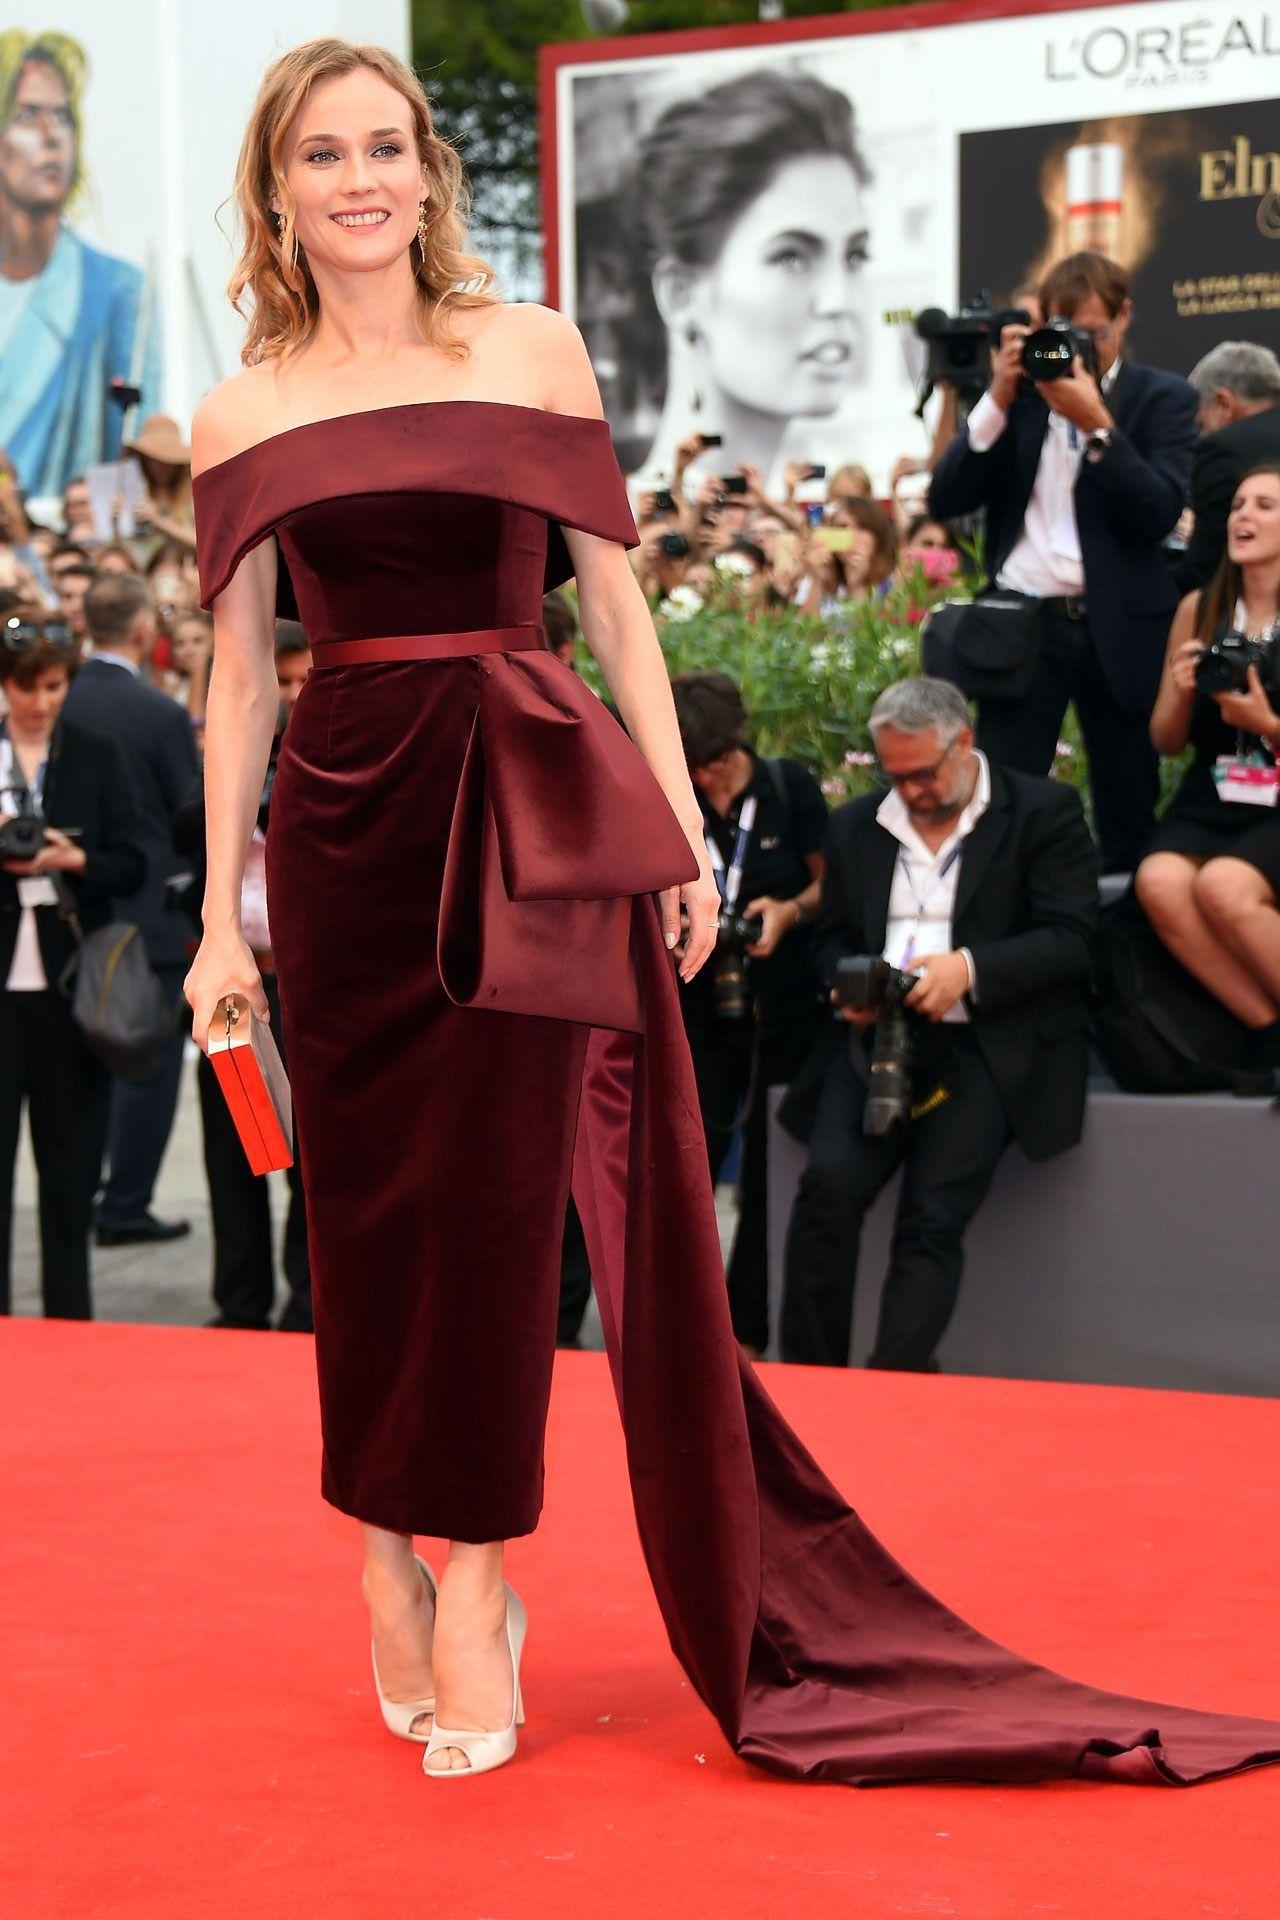 7da24c4eeb19 Venice Film Festival - Diane Kruger in Hugo Boss by Jason Wu